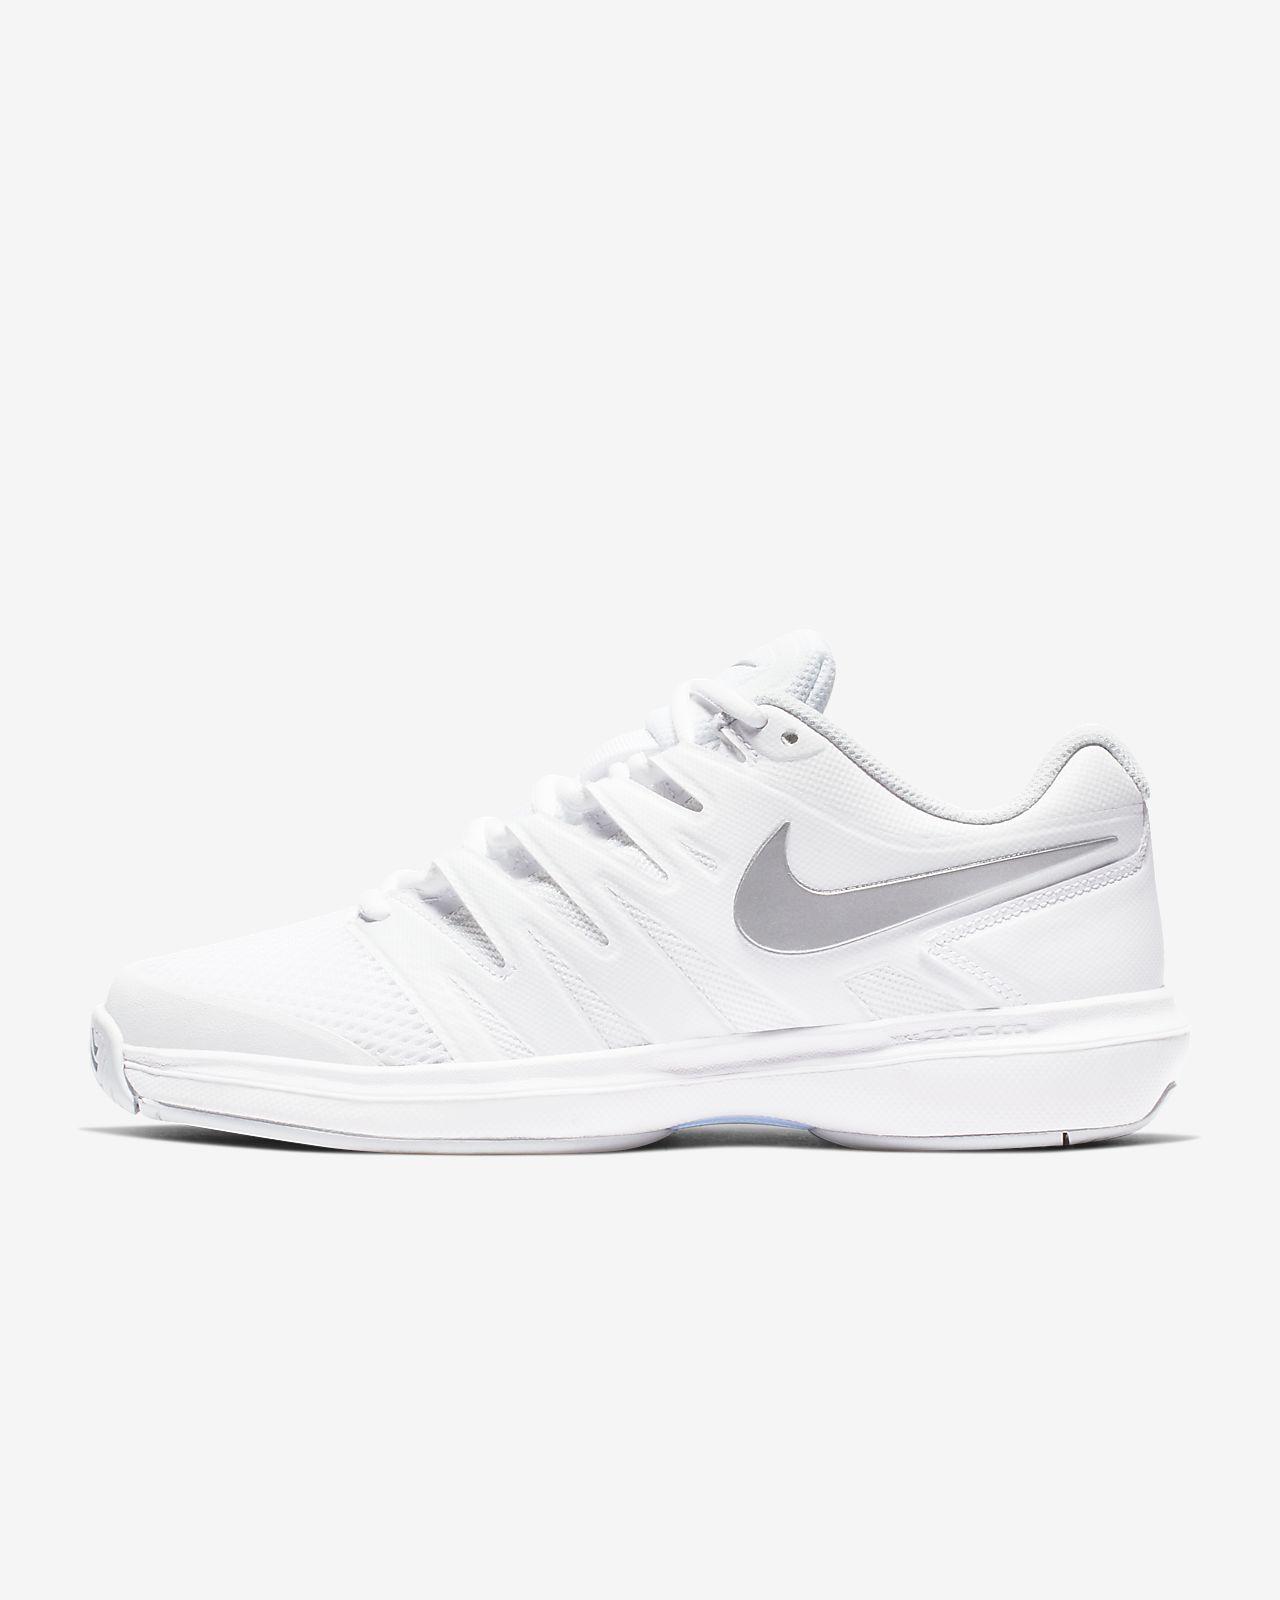 Sapatilhas de ténis para piso duro NikeCourt Air Zoom Prestige para mulher